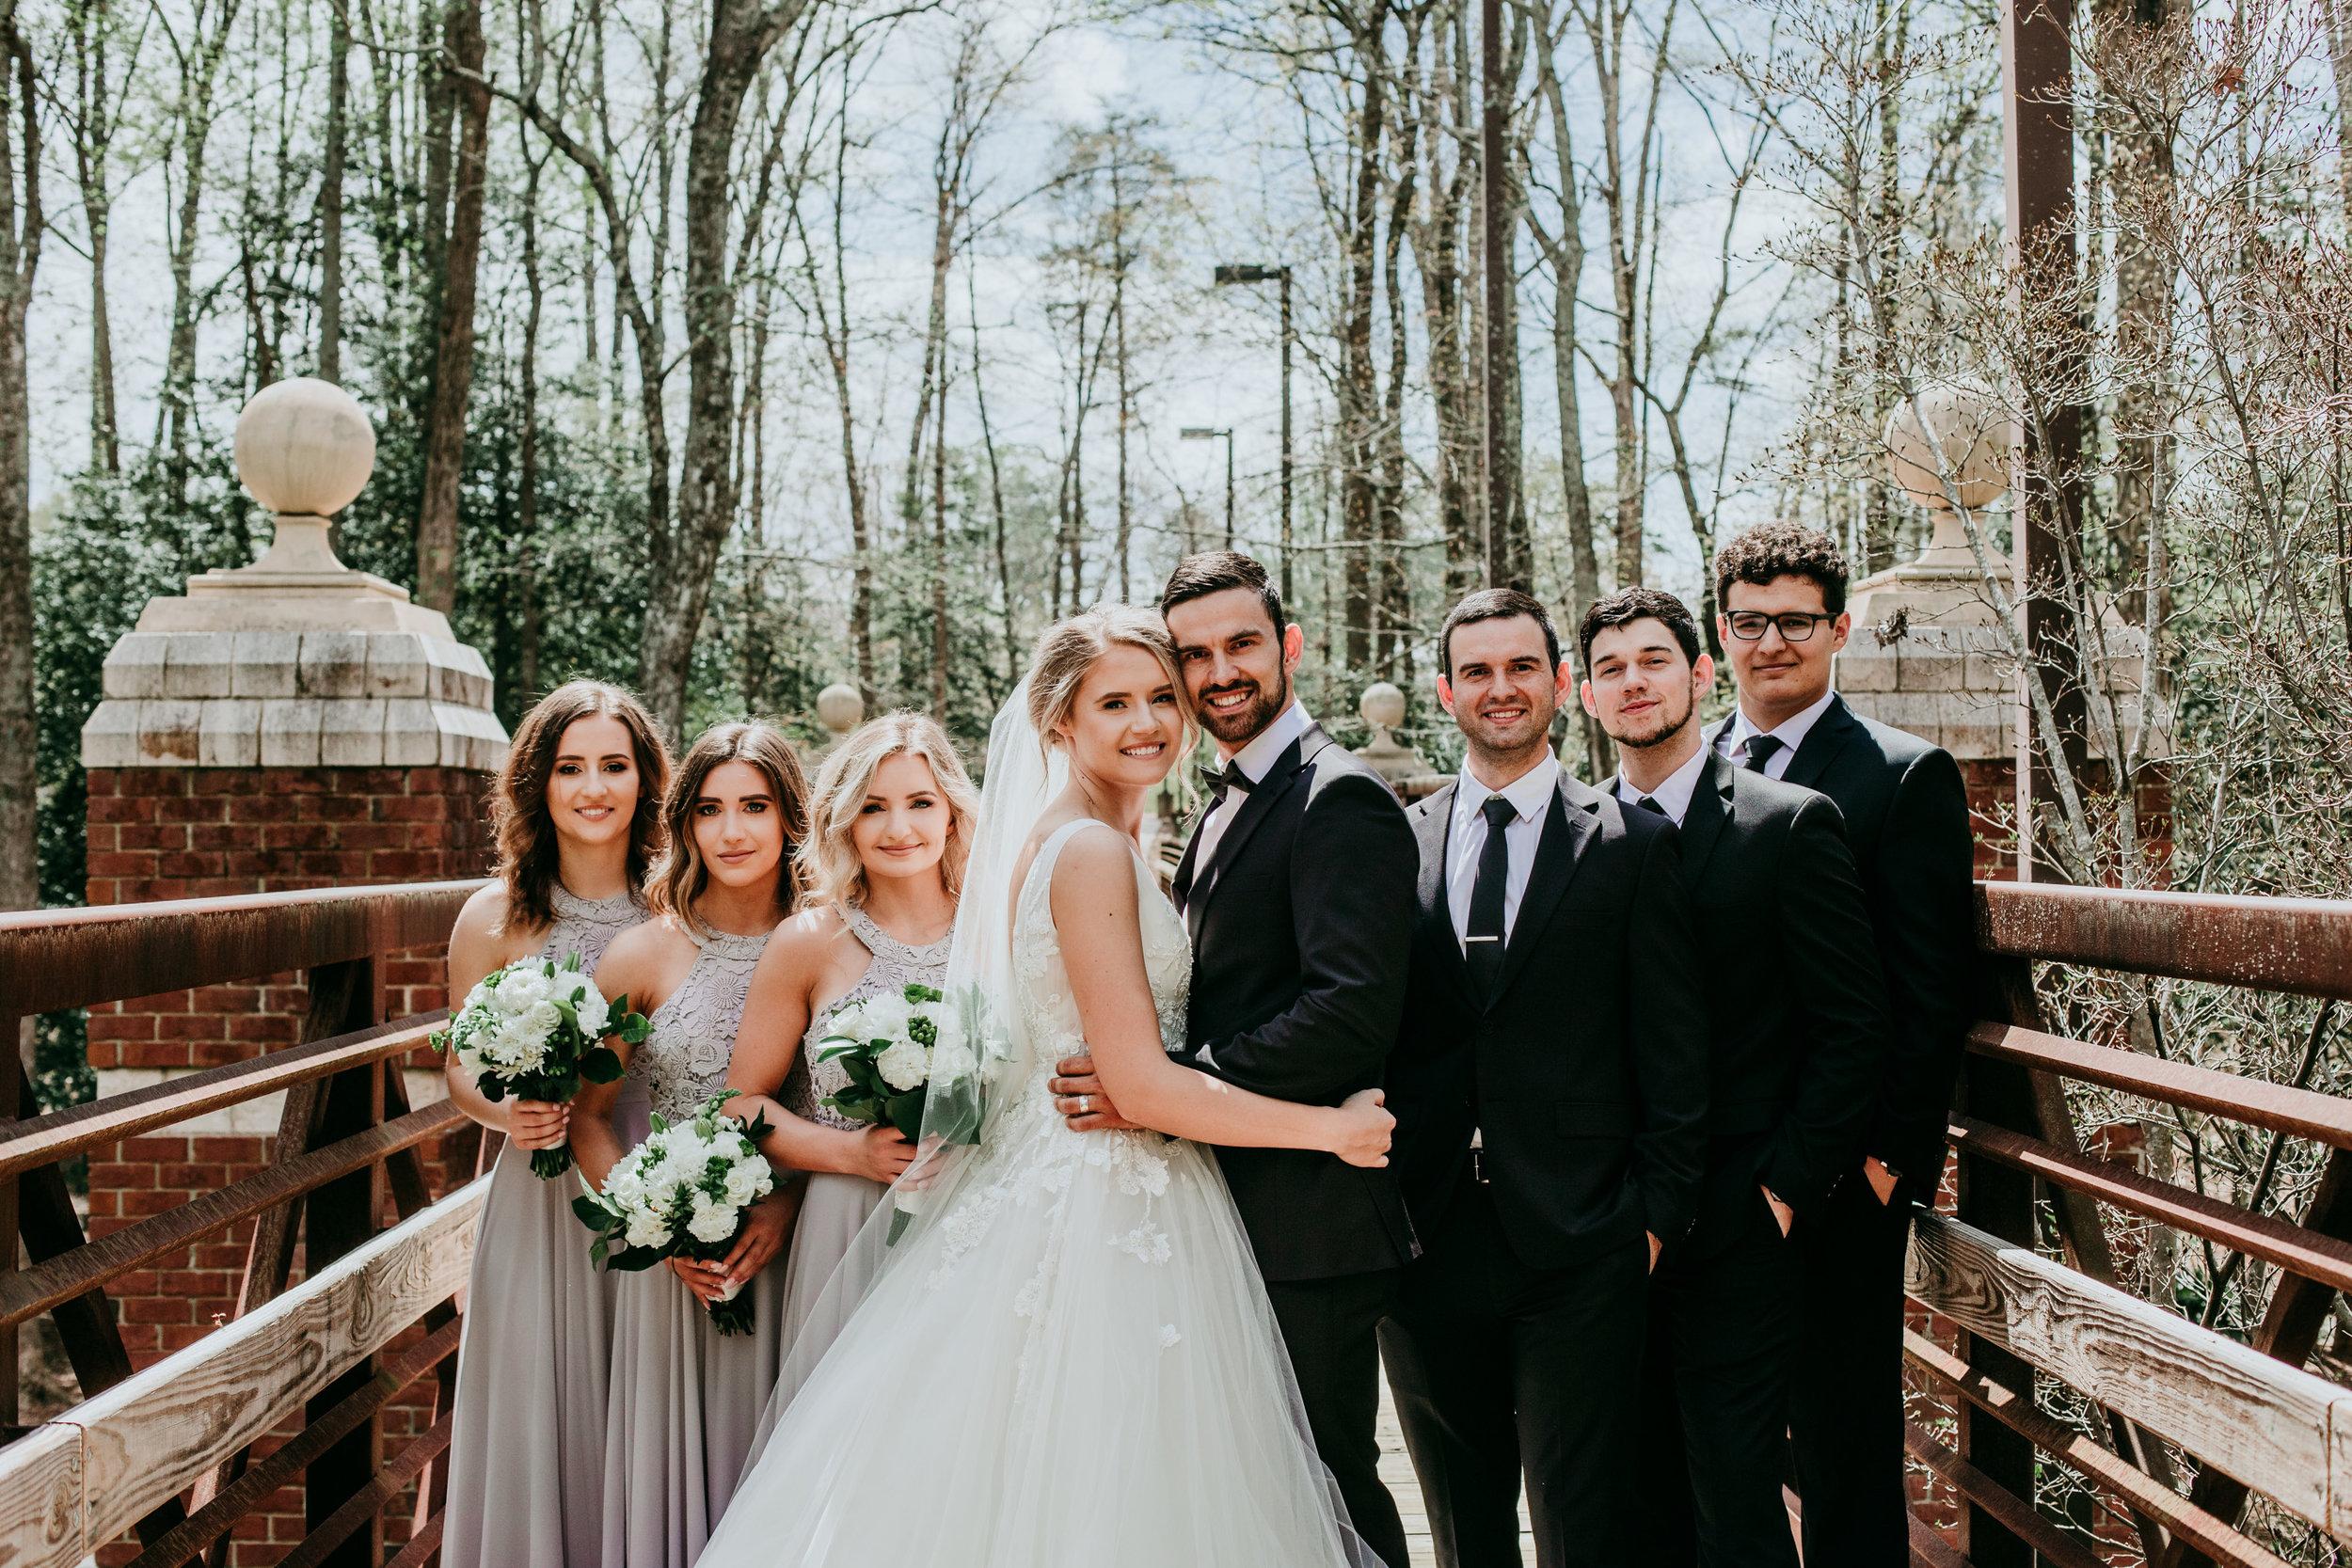 when-to-do-bride-and-groom-photos.jpg